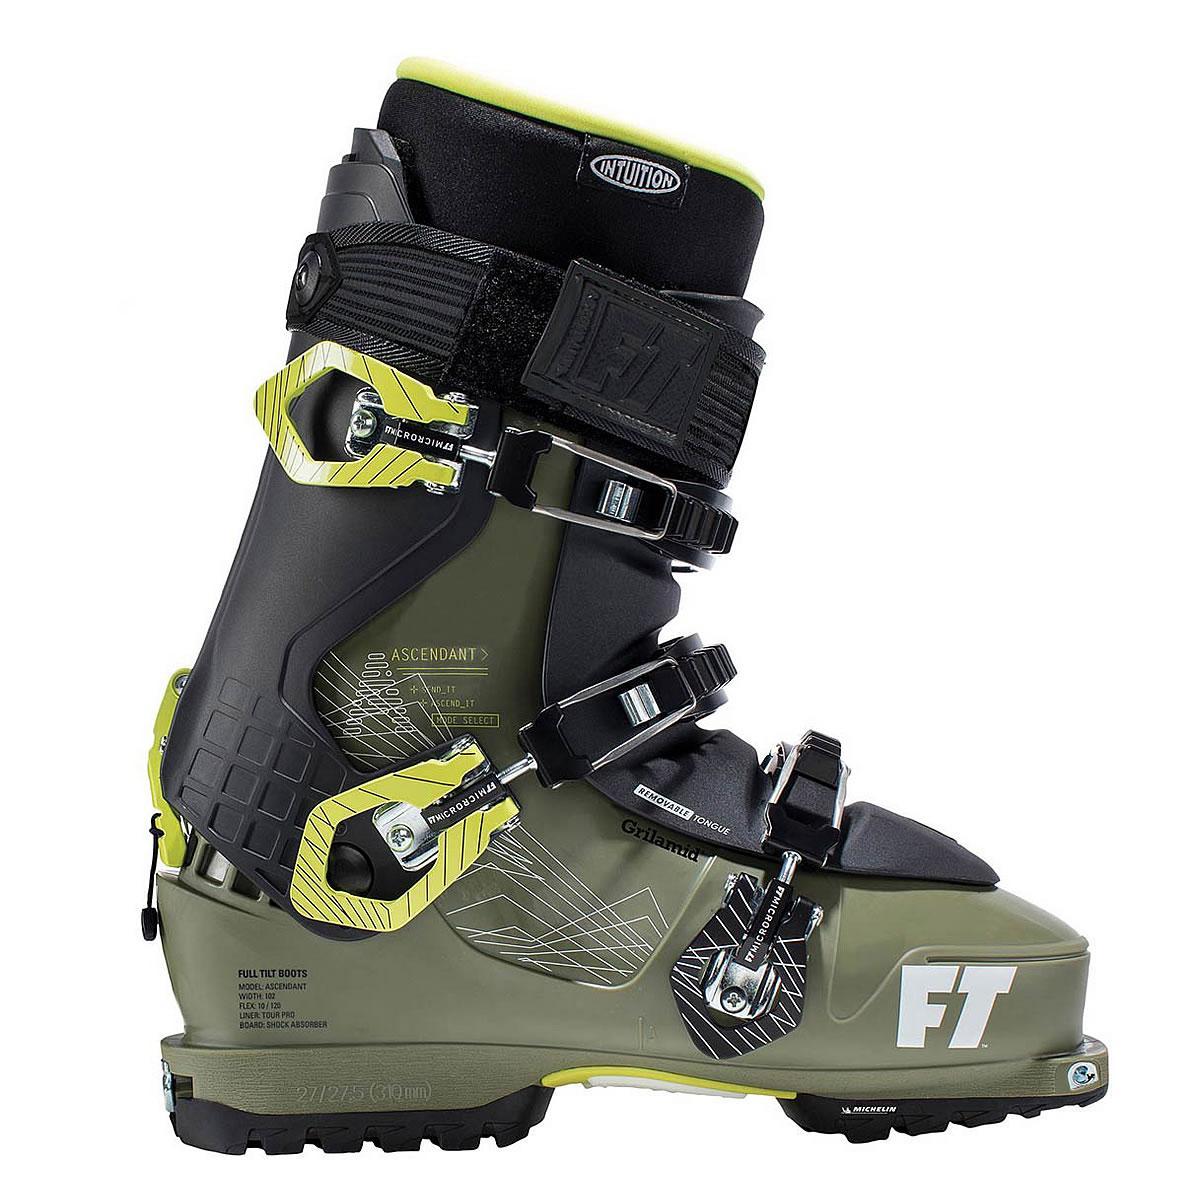 FT(フルチルト)2019 ASCENDANT アセンダント Full Tilt Boots TLT 27.5cm